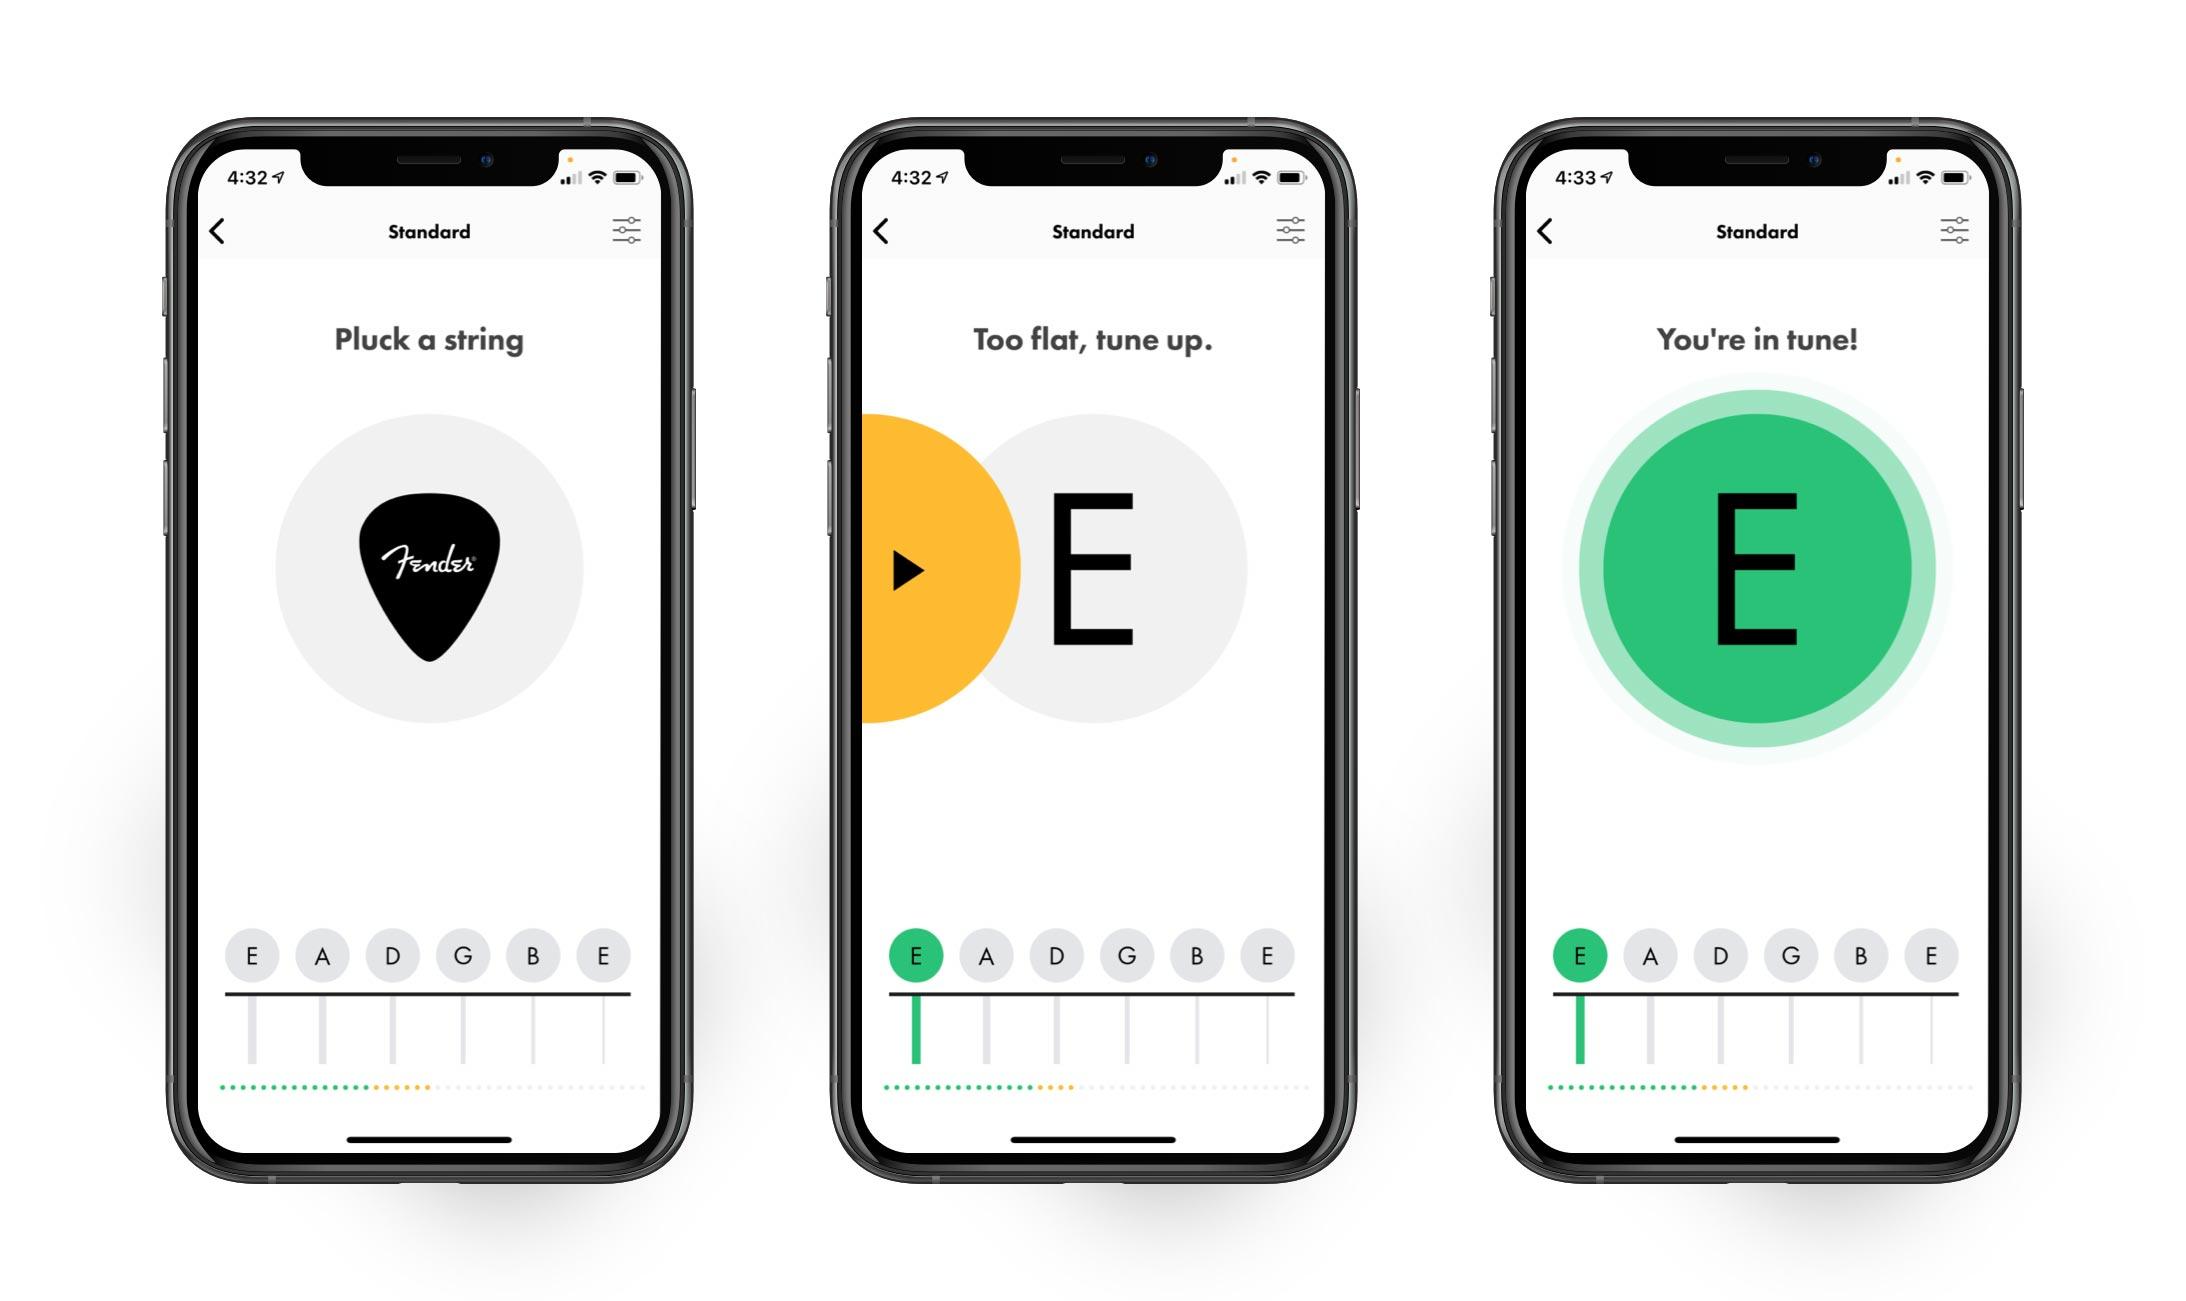 Fender Tune app showing Auto Tuner mode